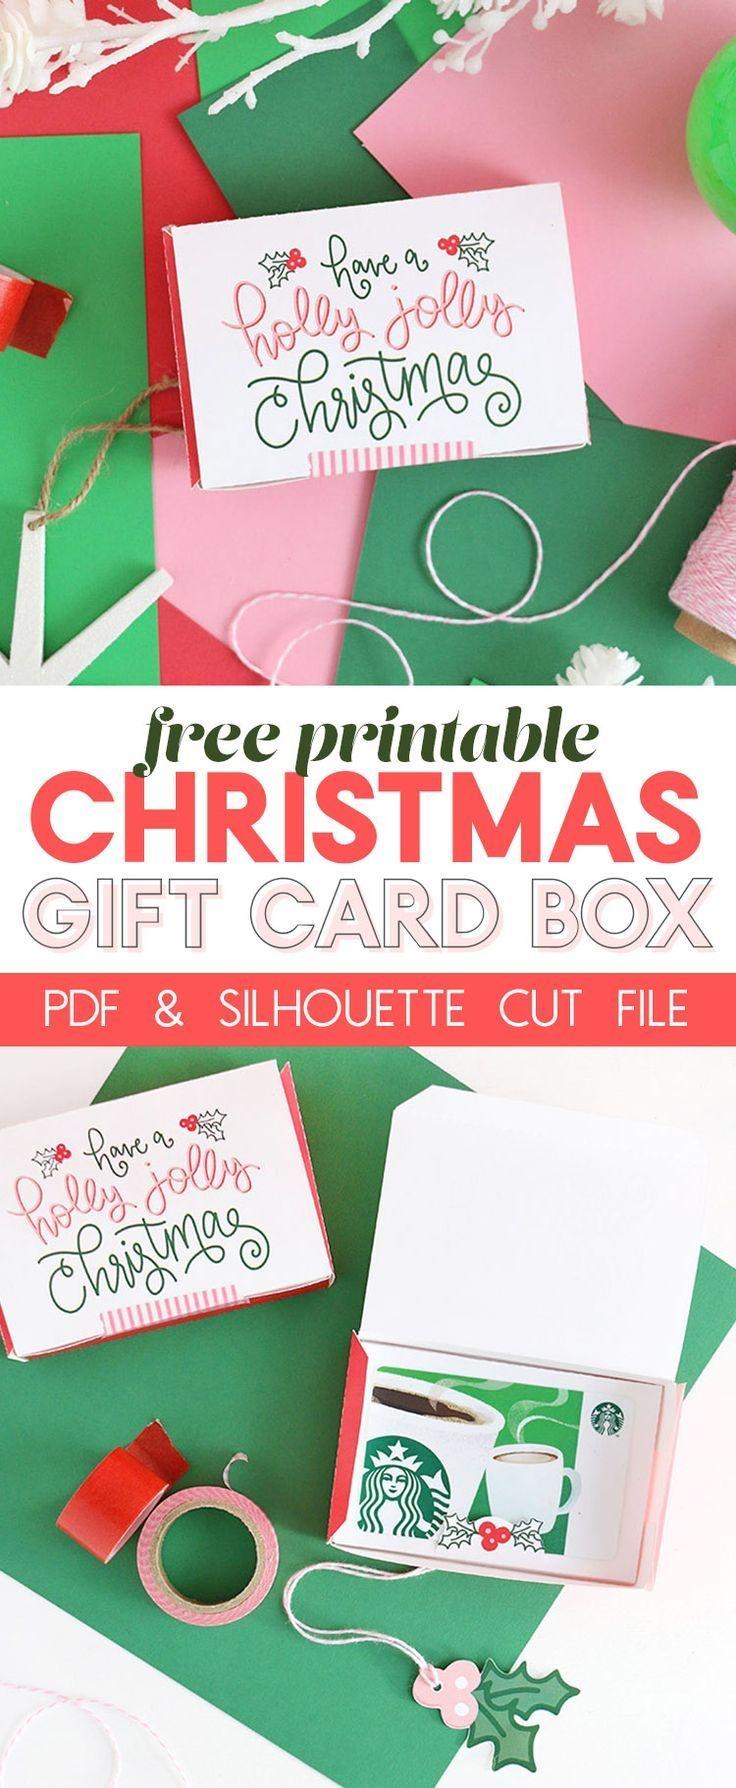 Diy Gift Card Box - Free Printable Gift Idea For Christmas | Persia - Free Printable Christmas Gift Cards